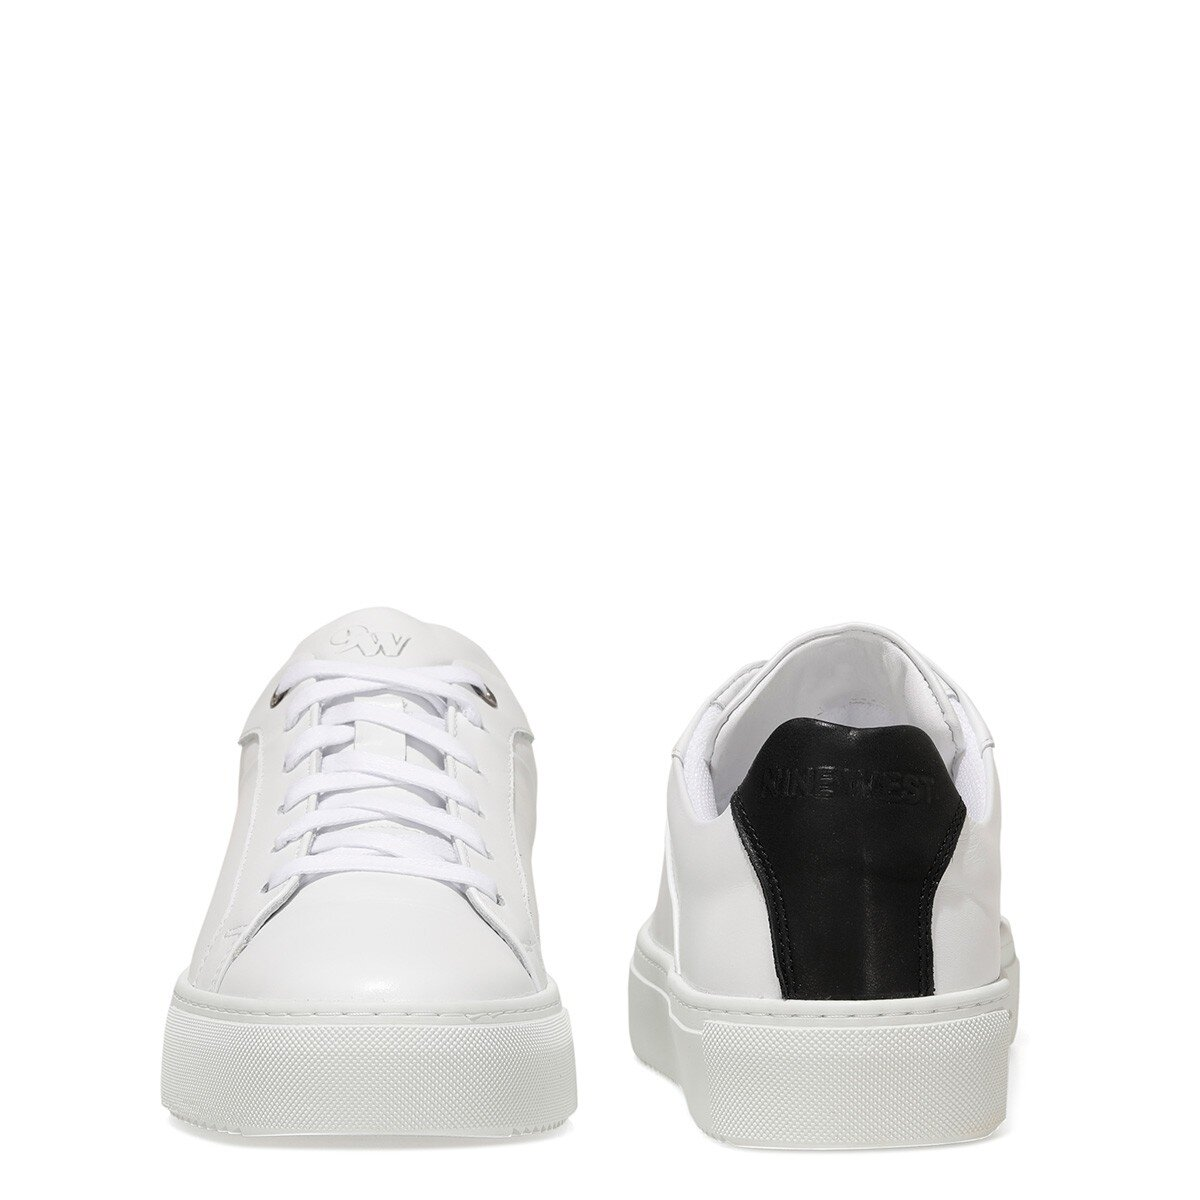 DUMDA 1FX Beyaz Erkek Sneaker